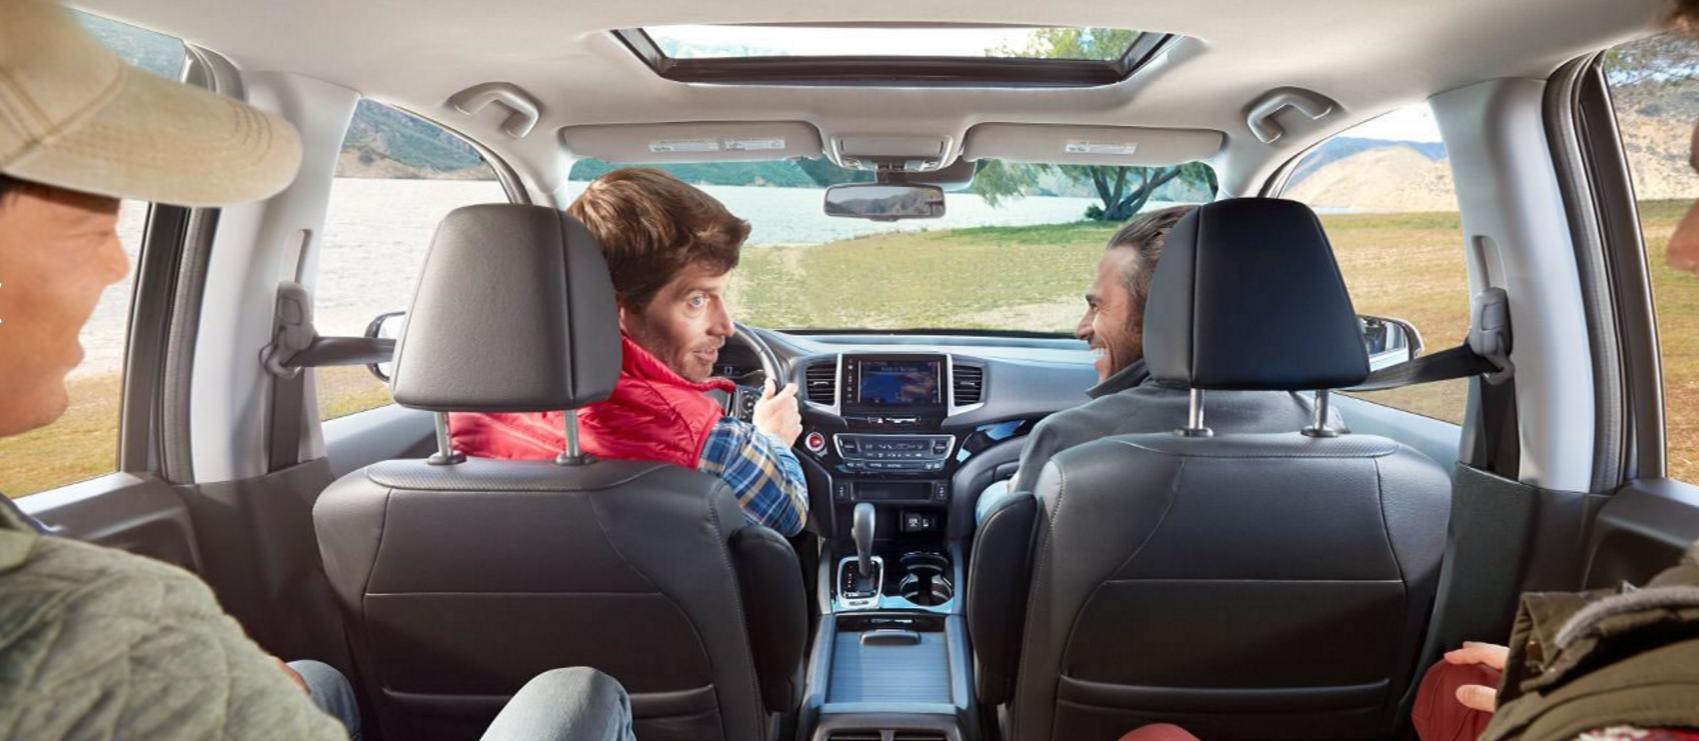 2017-Honda-Ridgeline-Sedan-safety